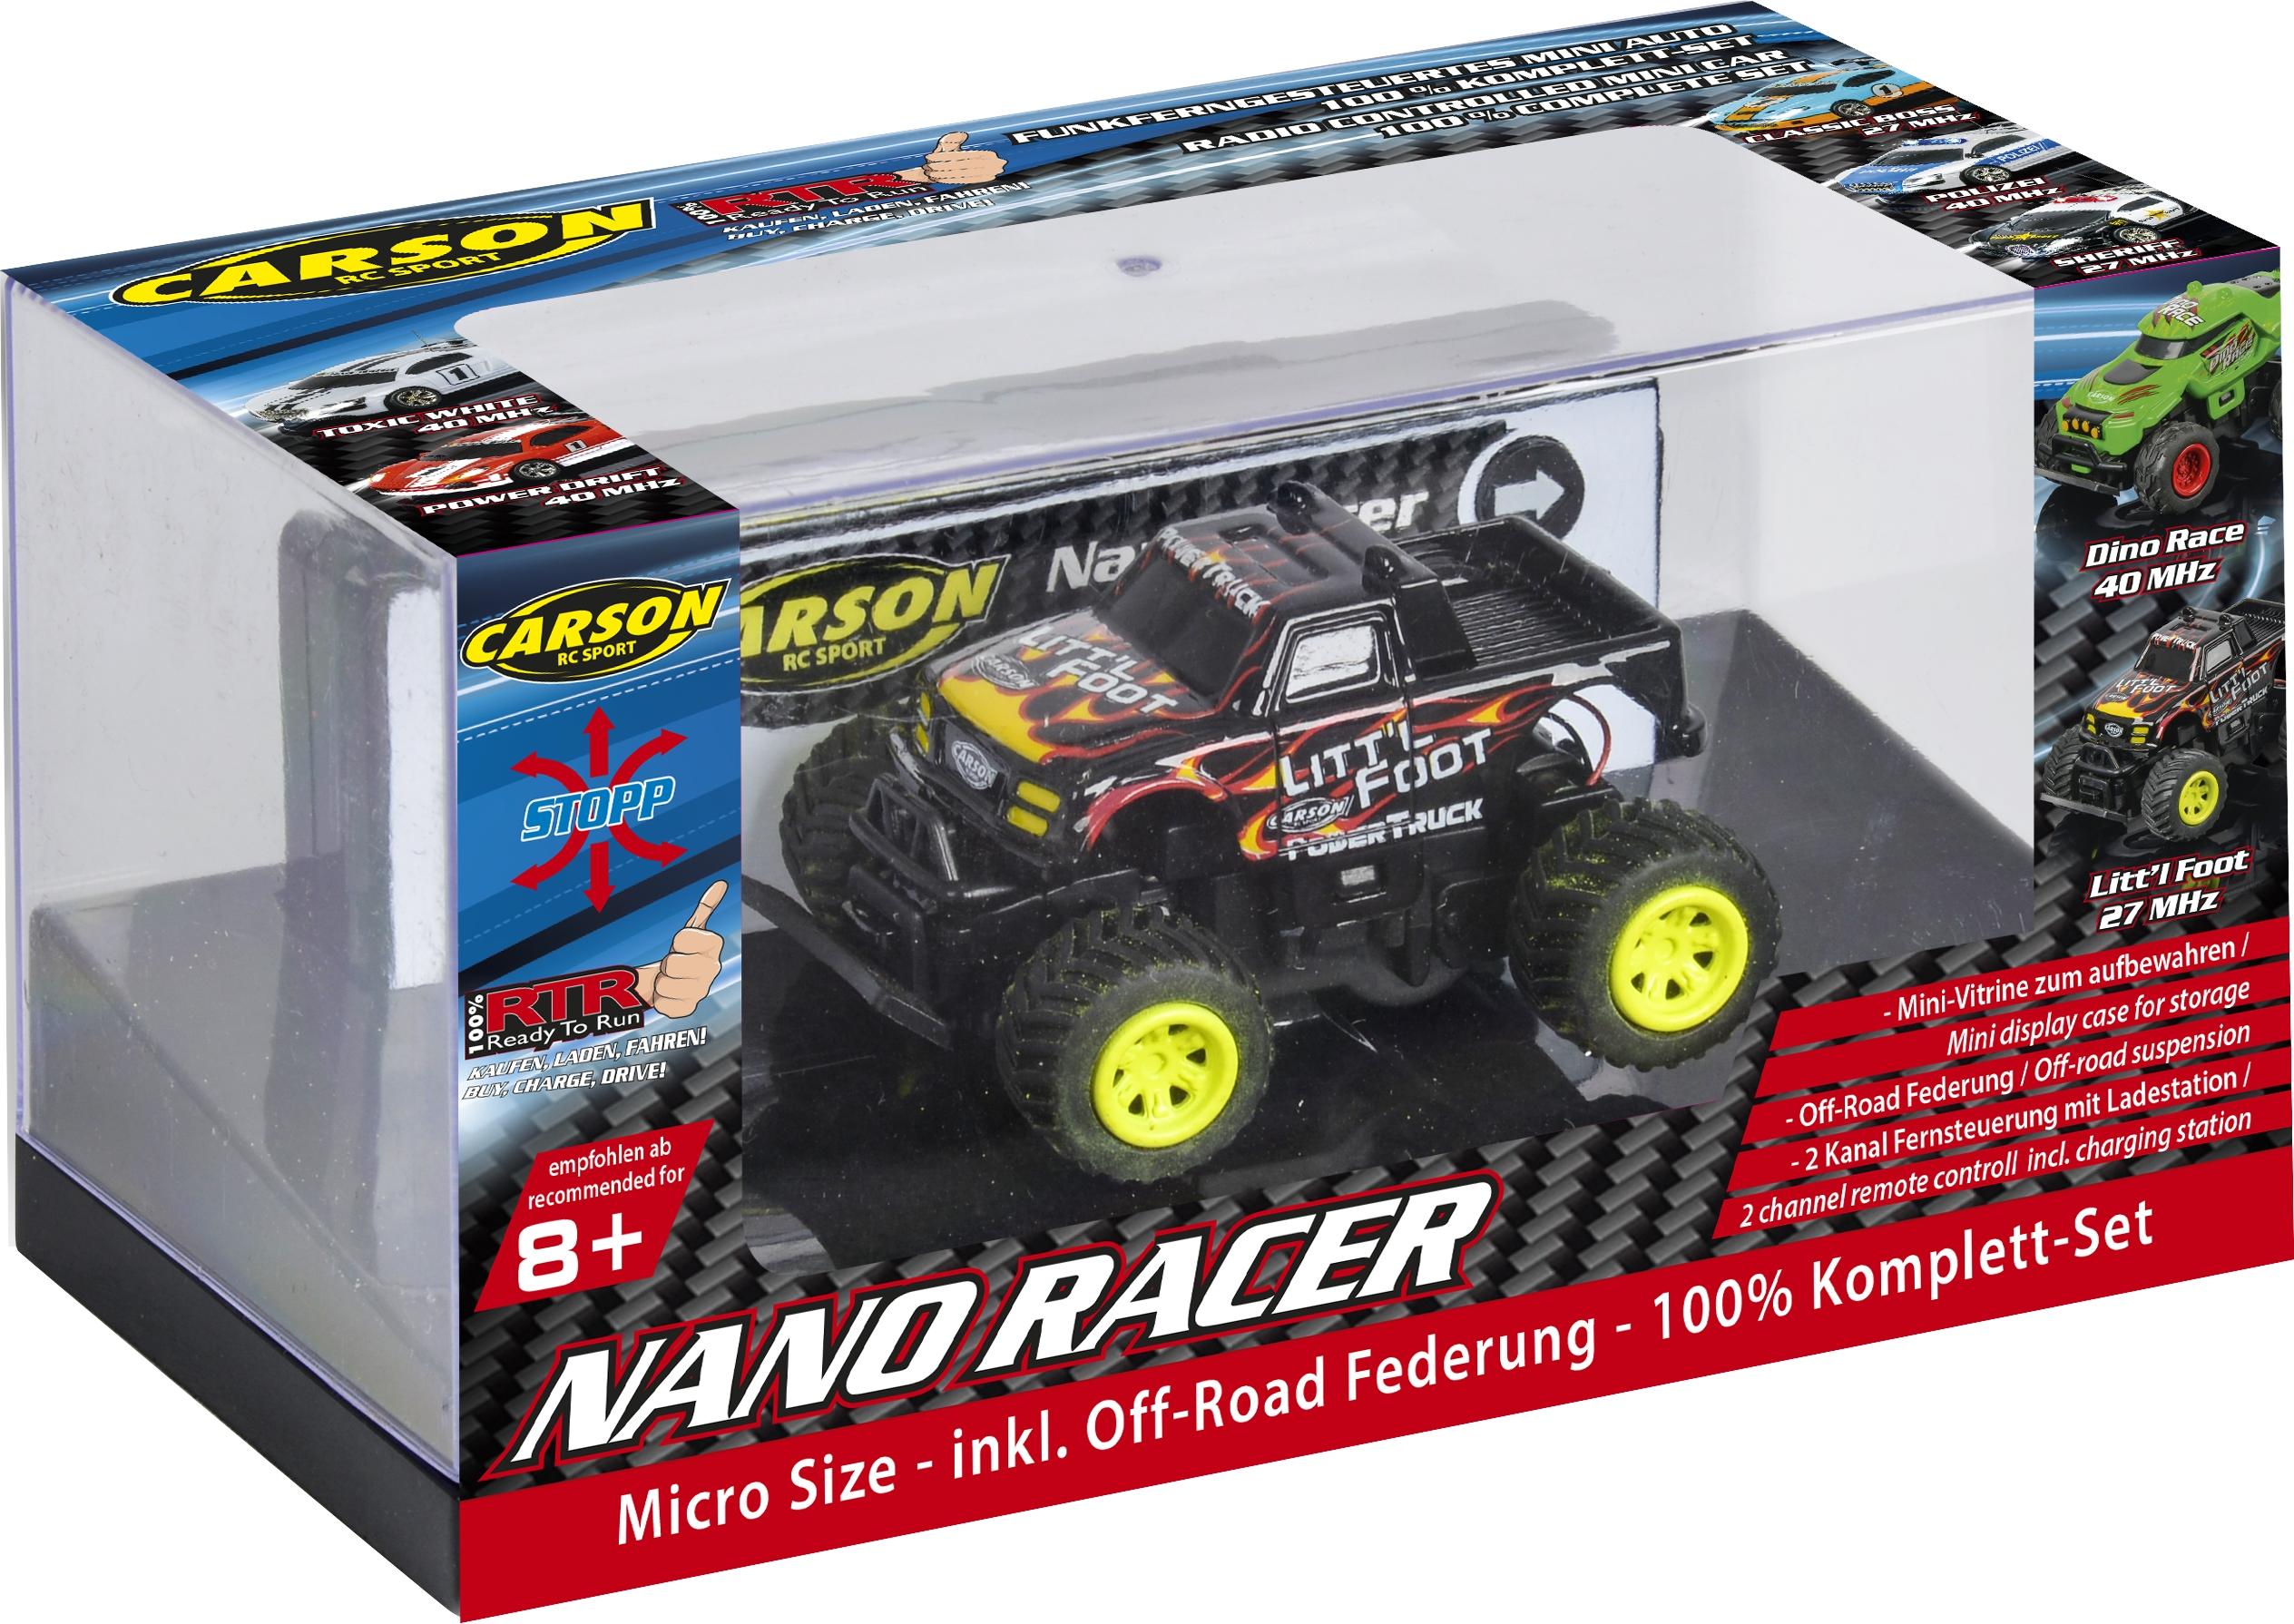 NANO RACER Litt´l Foot offroad, 1:60, 4 kužely, 100% RTR